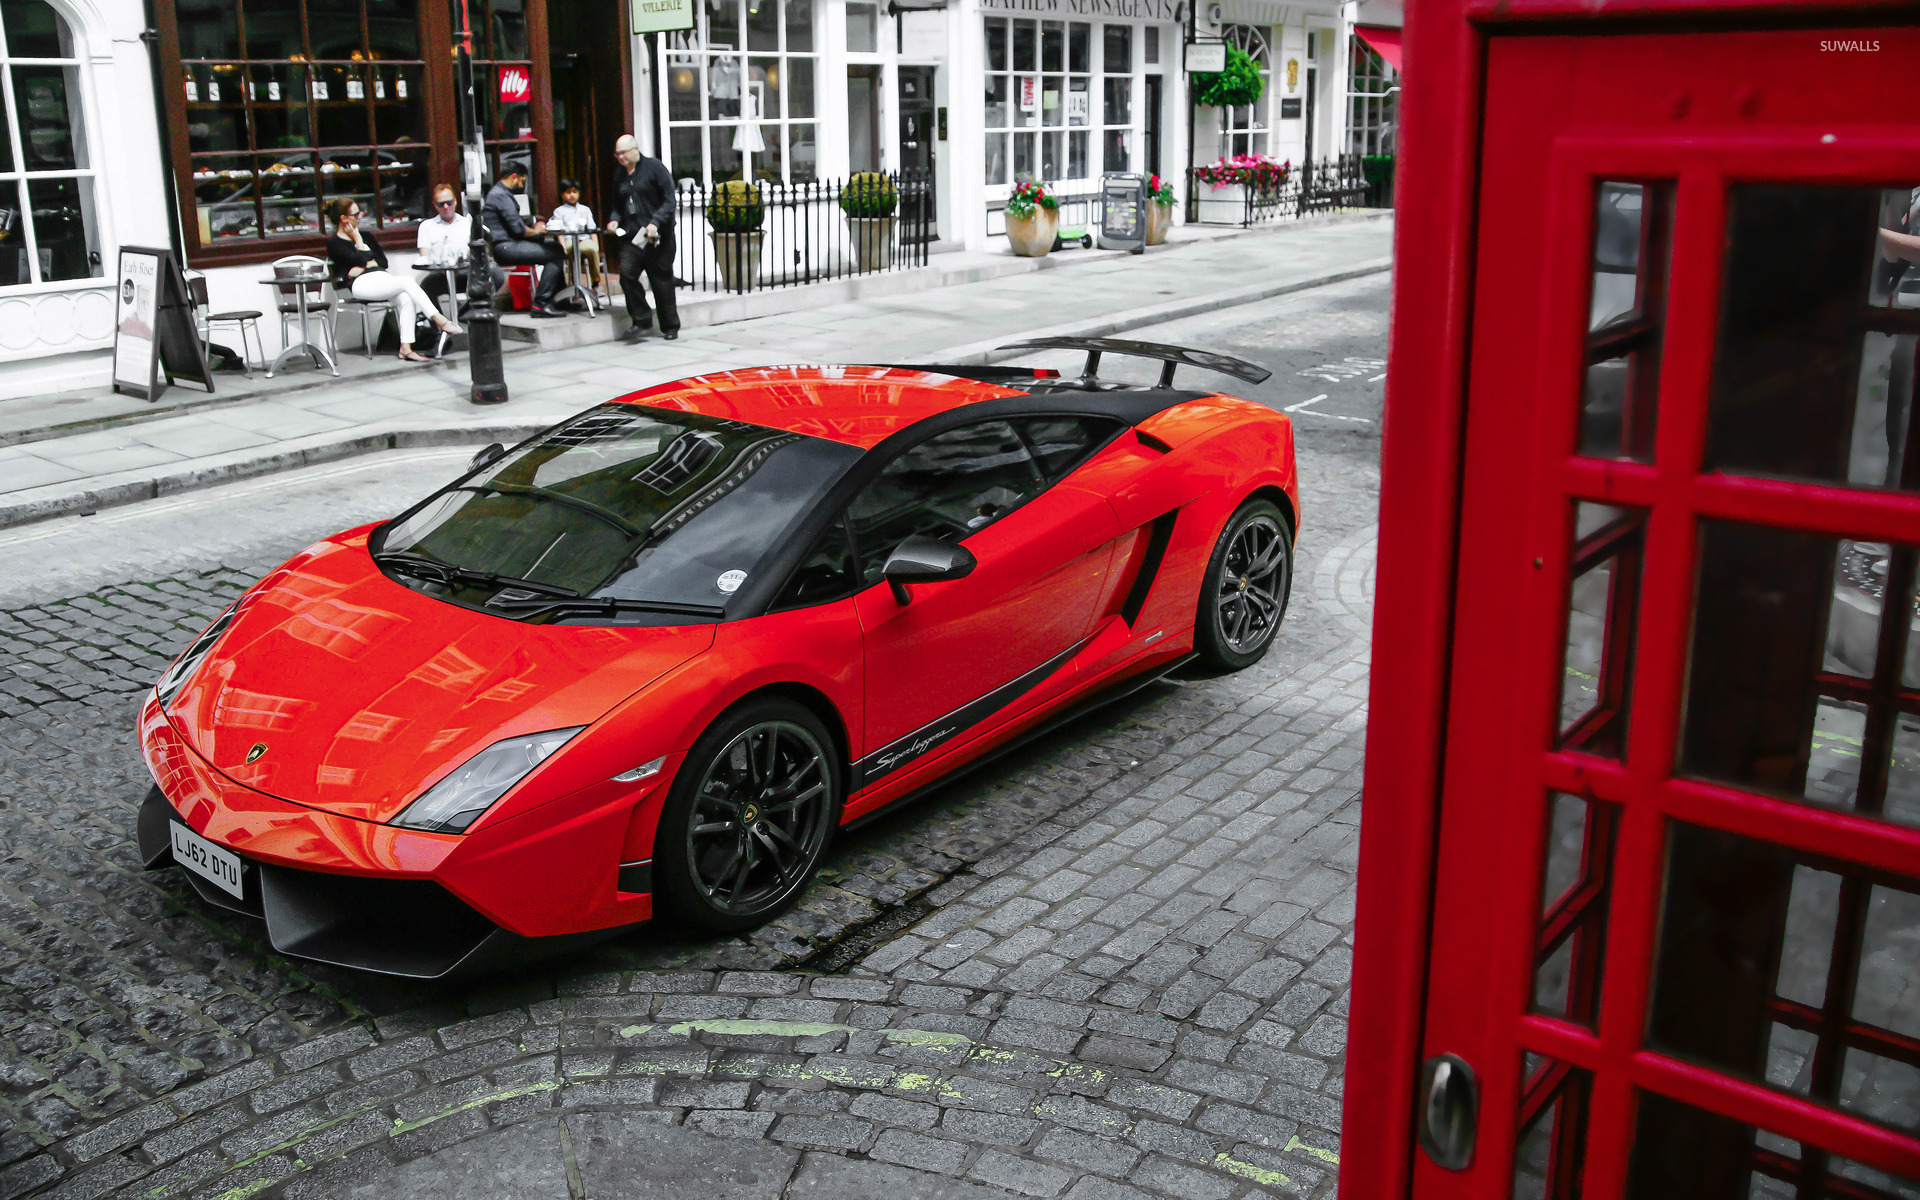 Red Lamborghini Gallardo Superleggera top view wallpaper ... Red Lamborghini Gallardo Wallpaper